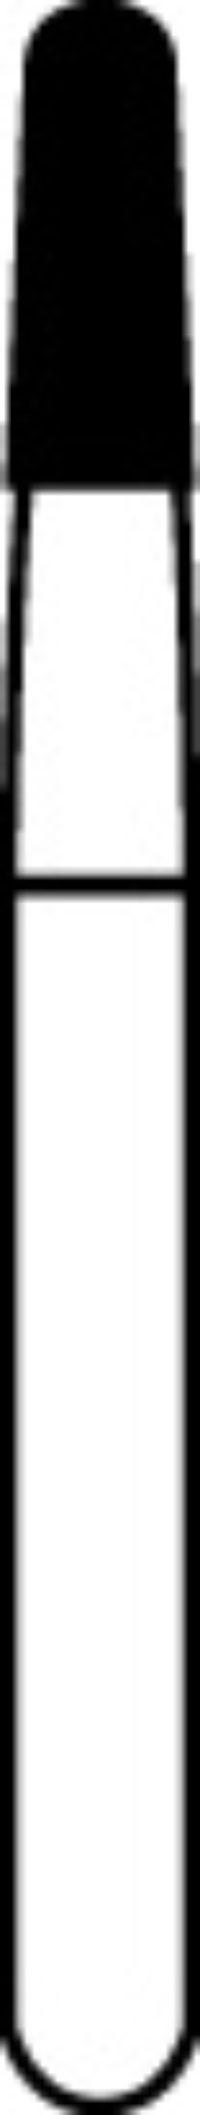 CLOSEOUT SALE: 1172 Taper Round End Carbide